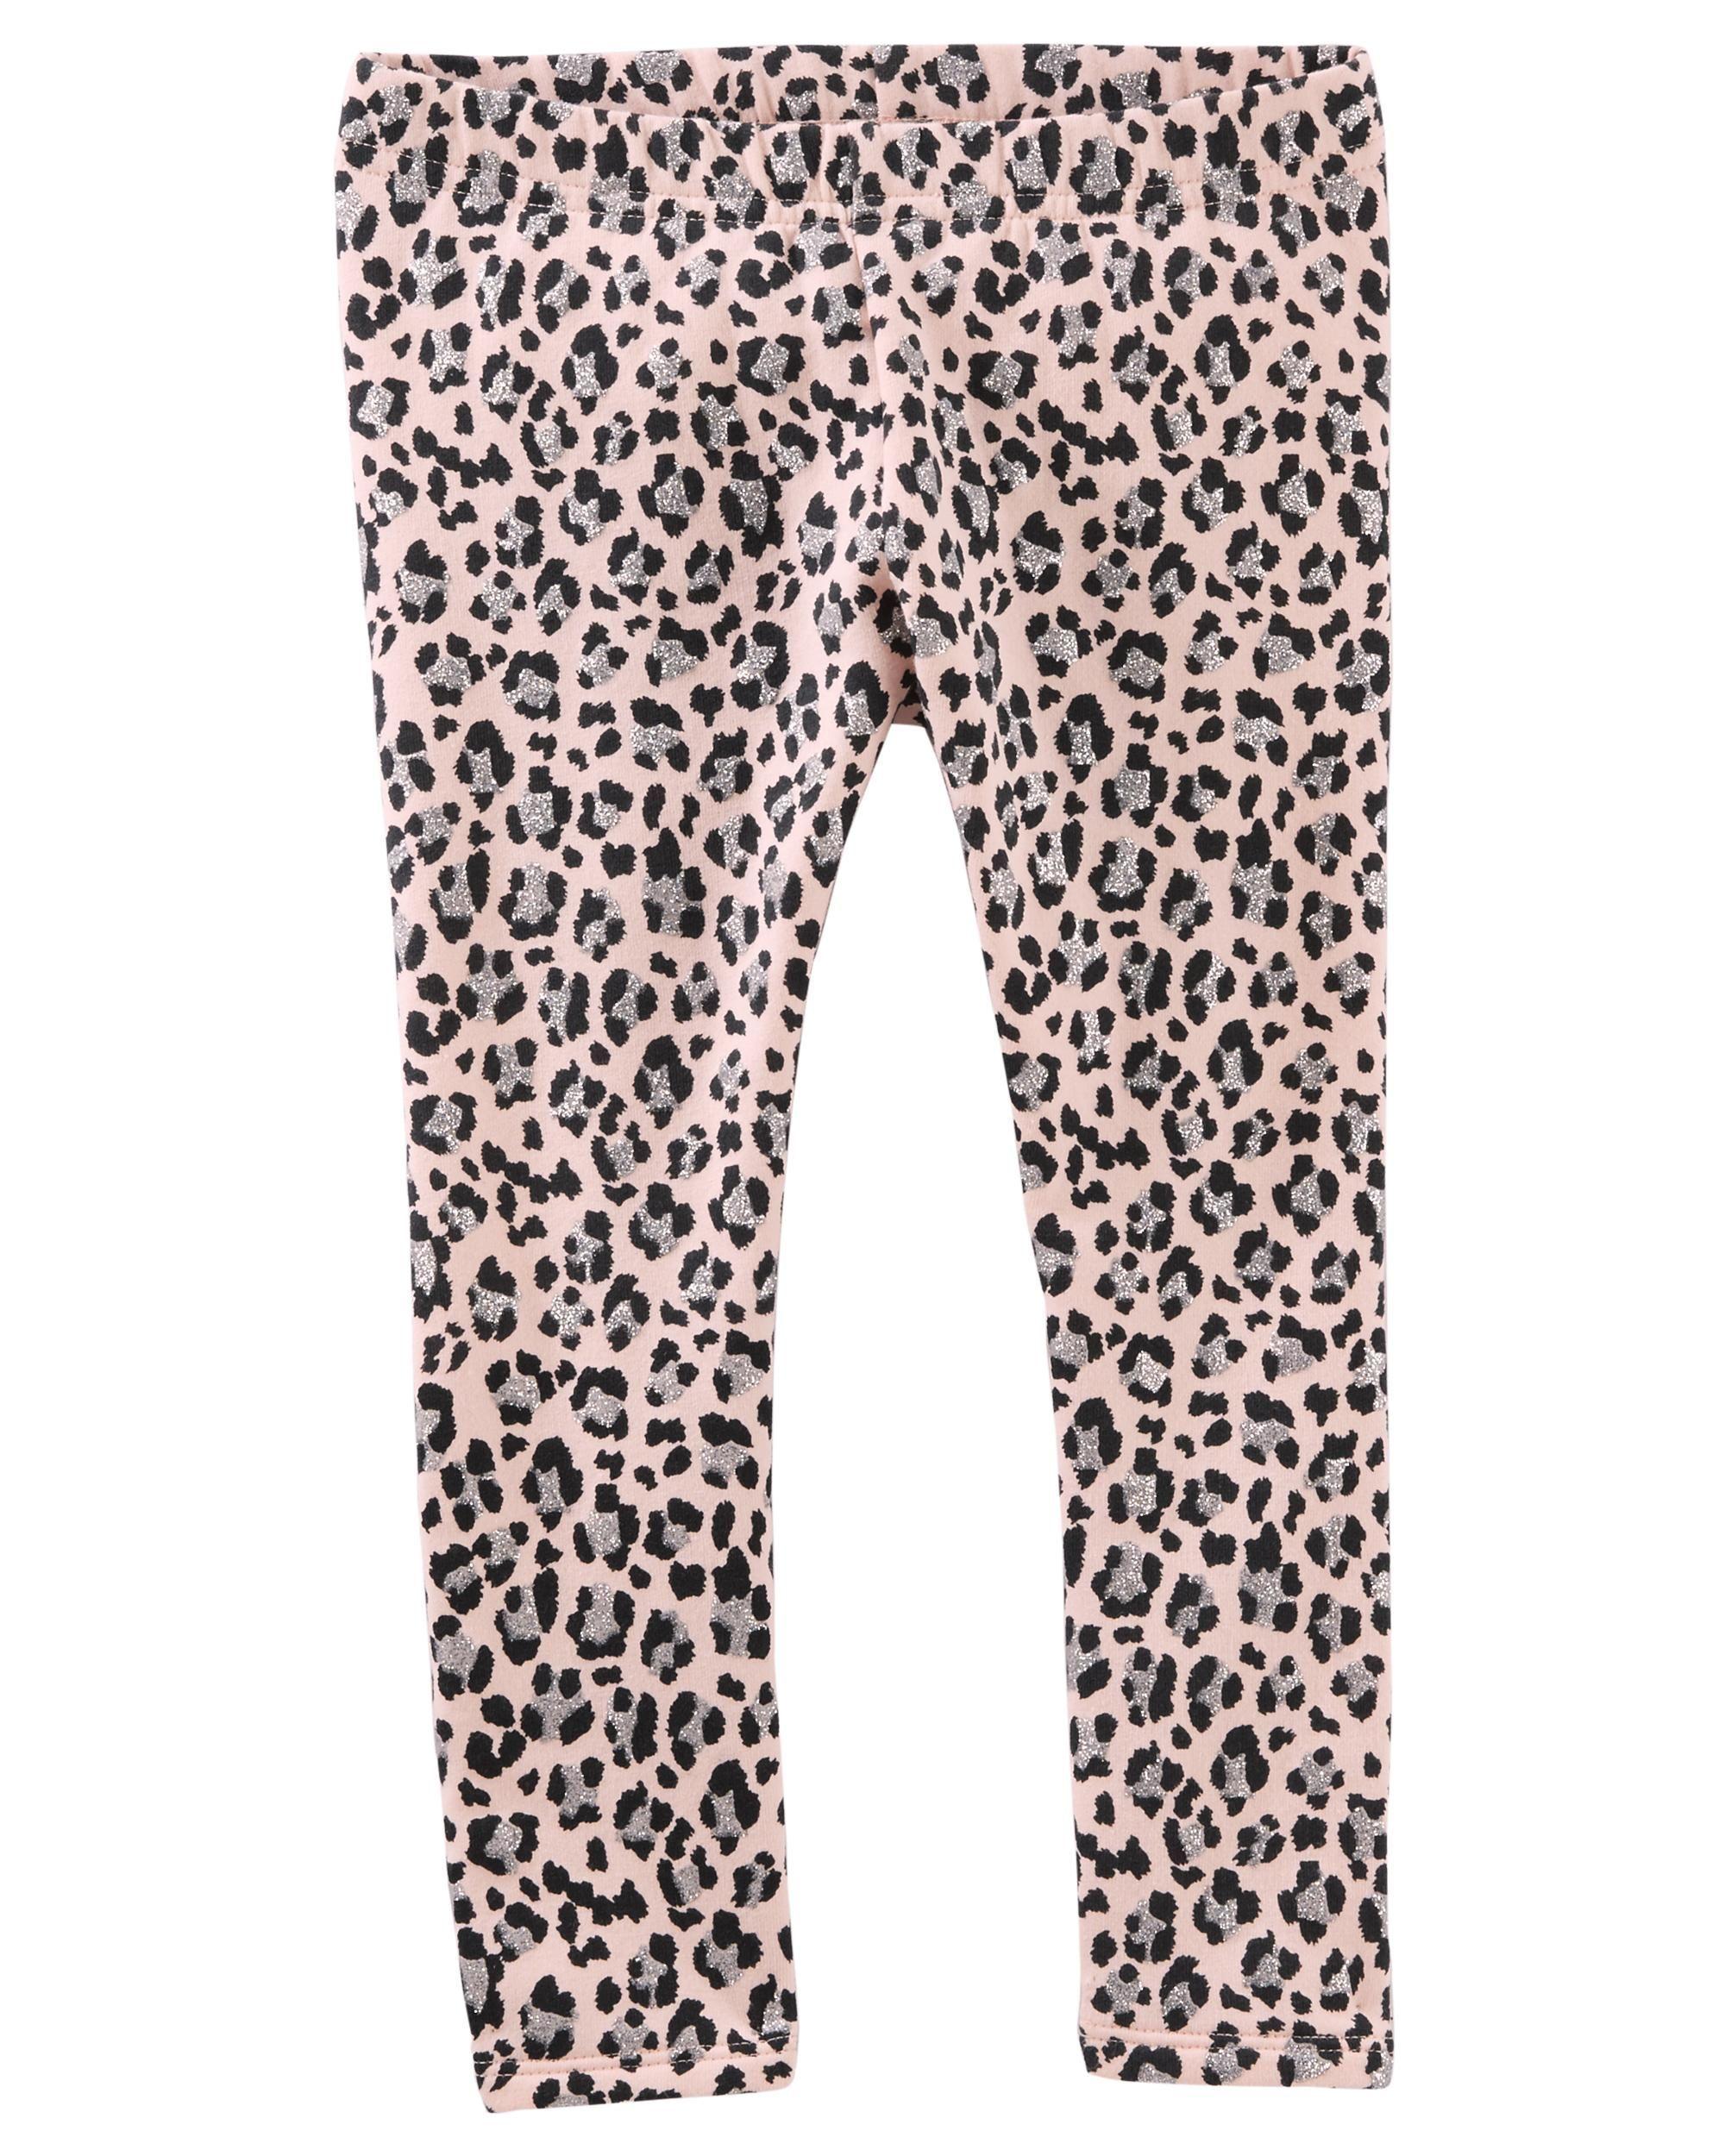 beed4839d5f2 Fleece-Lined Animal Print Leggings | Baby Girl | Baby girl leggings ...